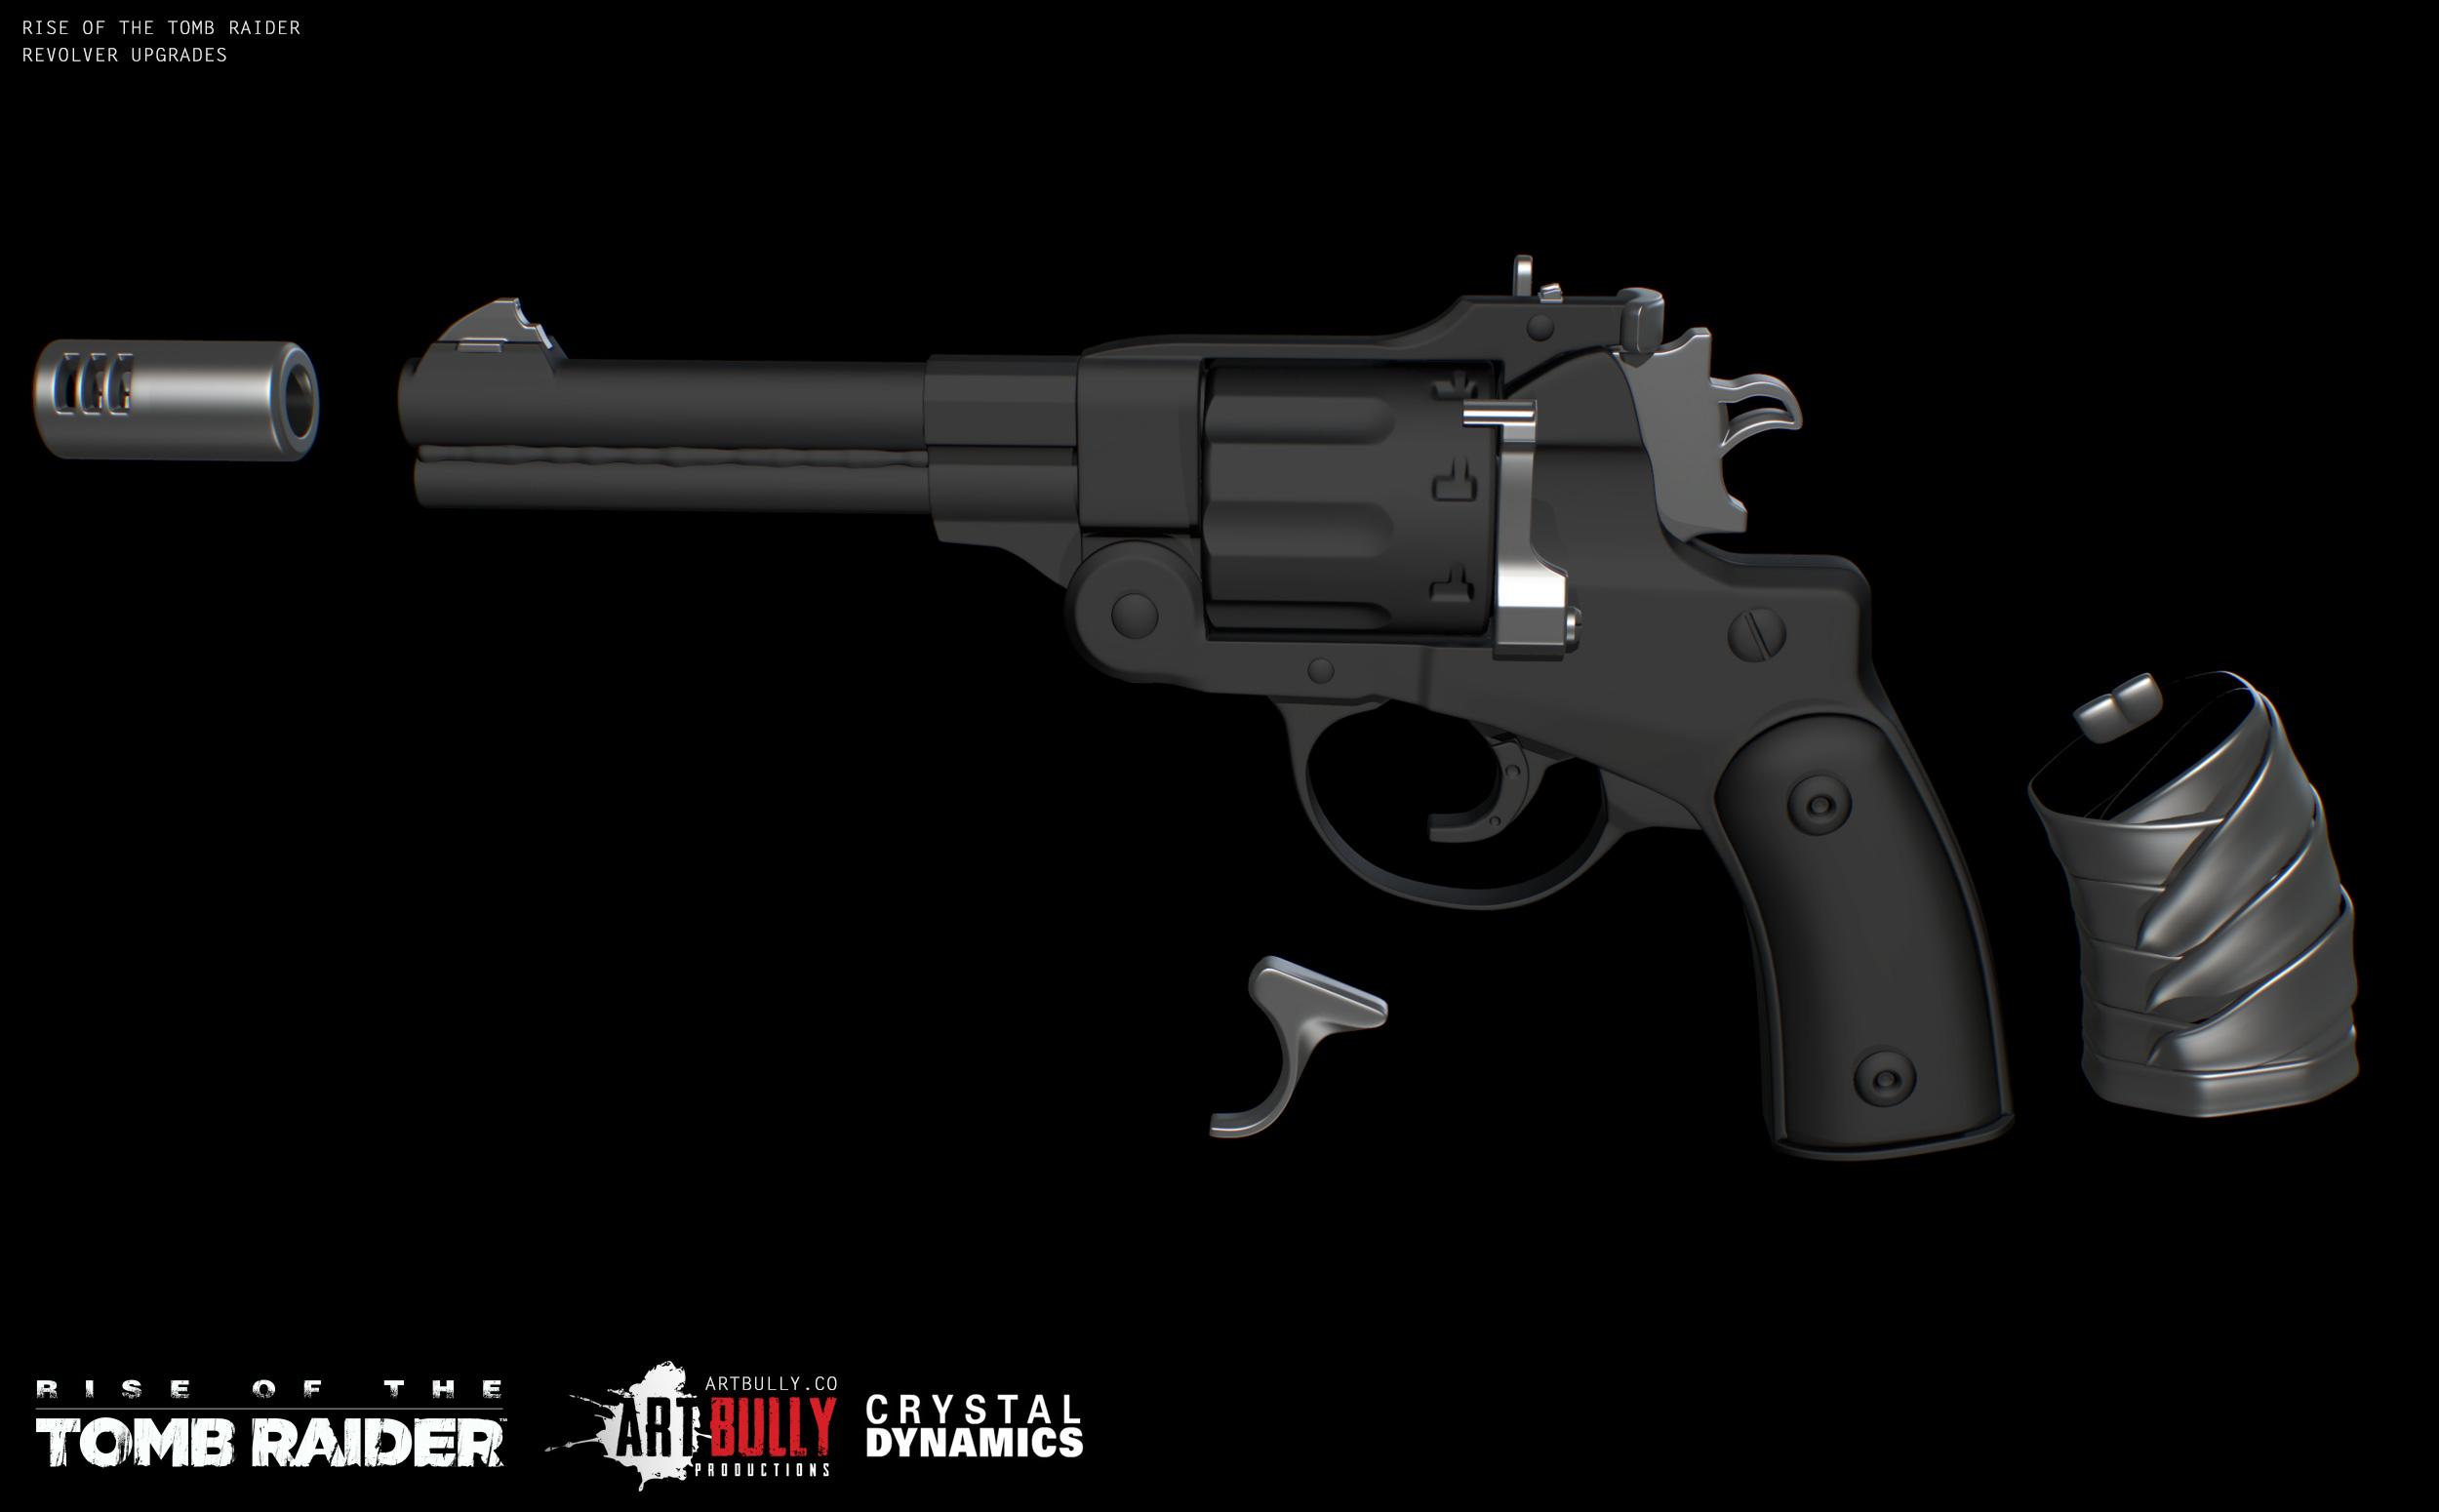 revolver_upgrades copy.jpg